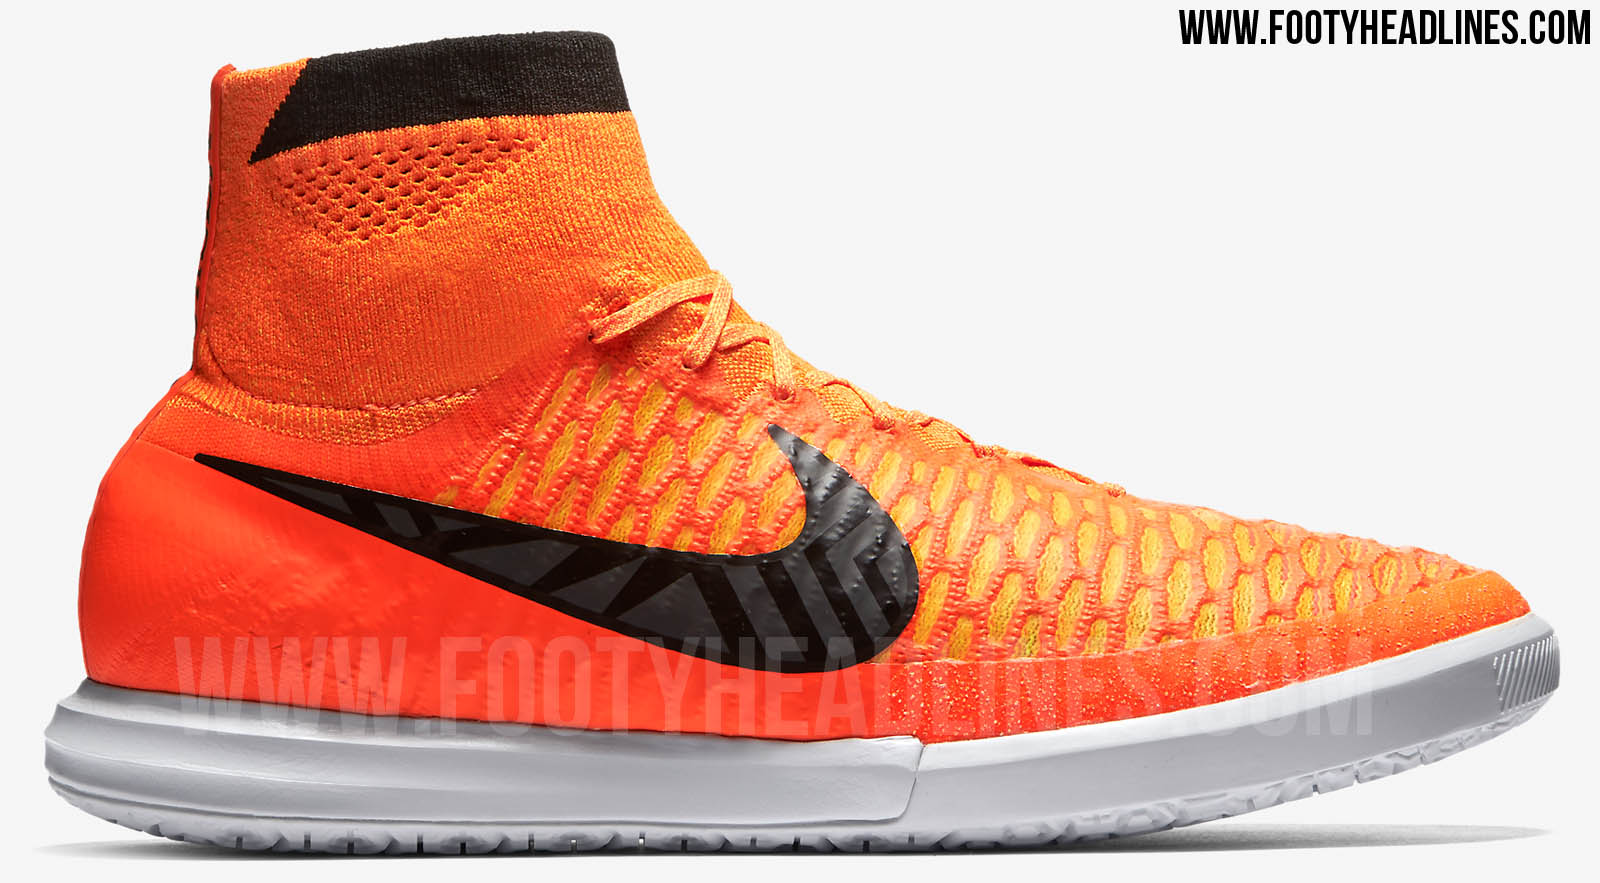 36d4d9f5eb5c Orange Nike Magista X Proximo Boots Released - Sports kicks